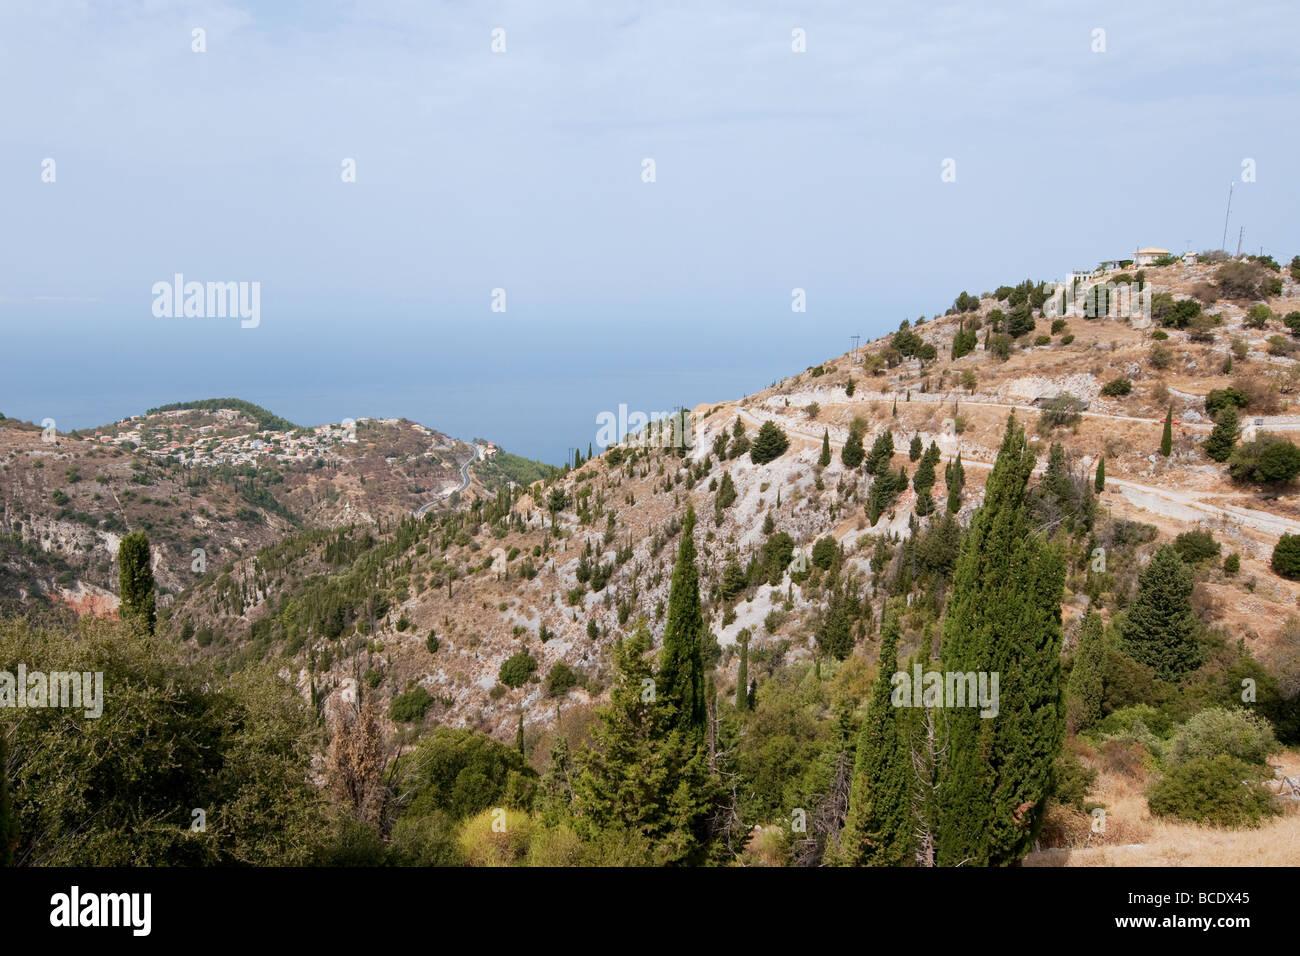 Landscape from Greek mainland near the west coast Greece - Stock Image